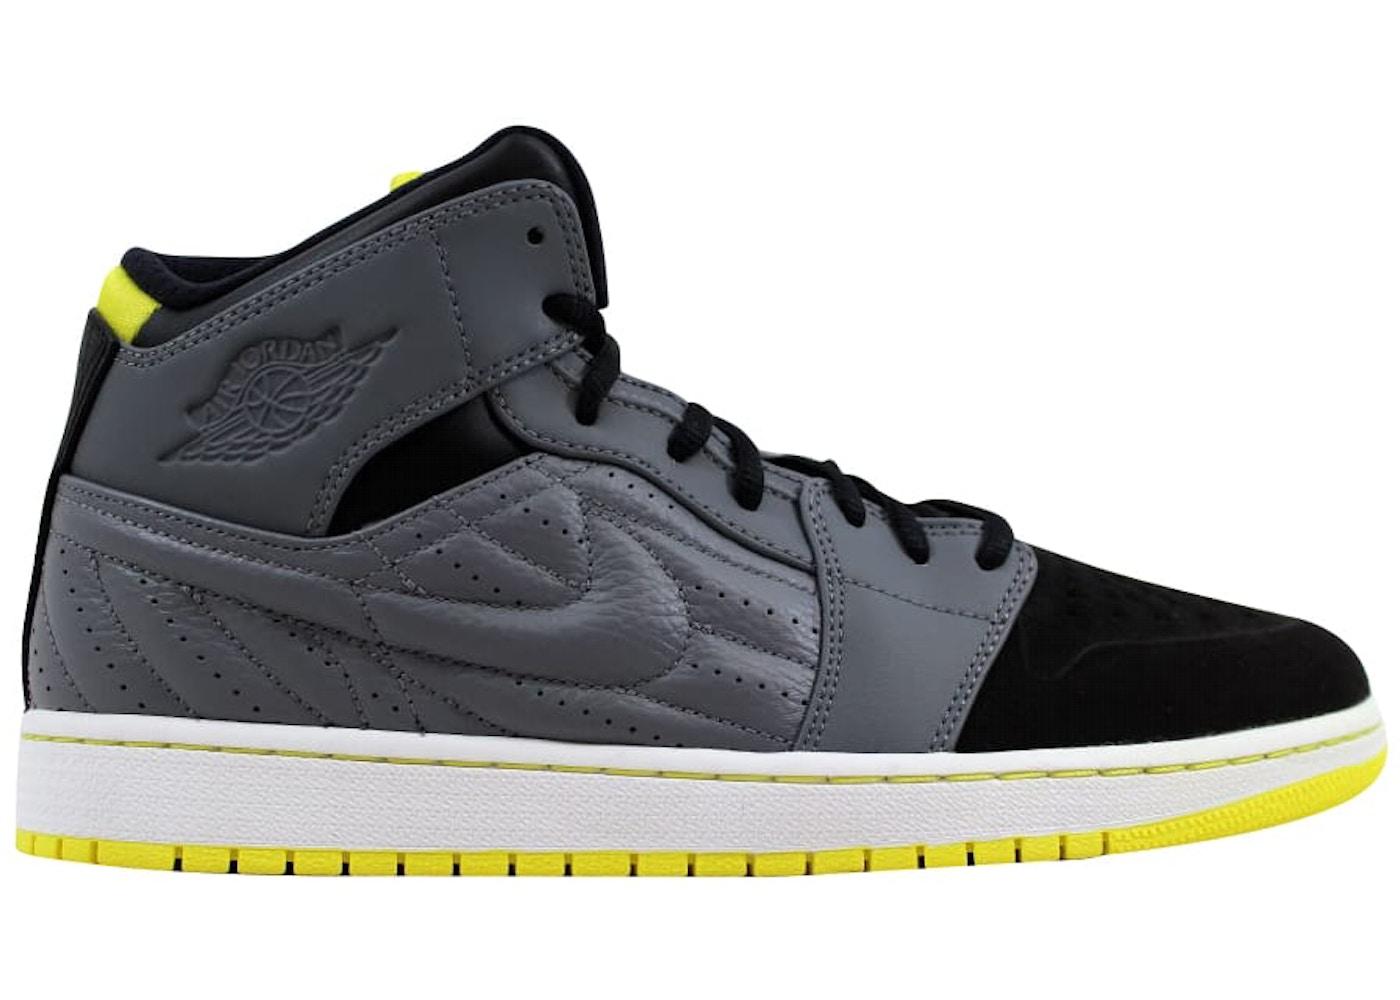 152515ff360f38 HypeAnalyzer · Air Jordan I 1 Retro '99 Cool Grey/Vibrant Yellow ...